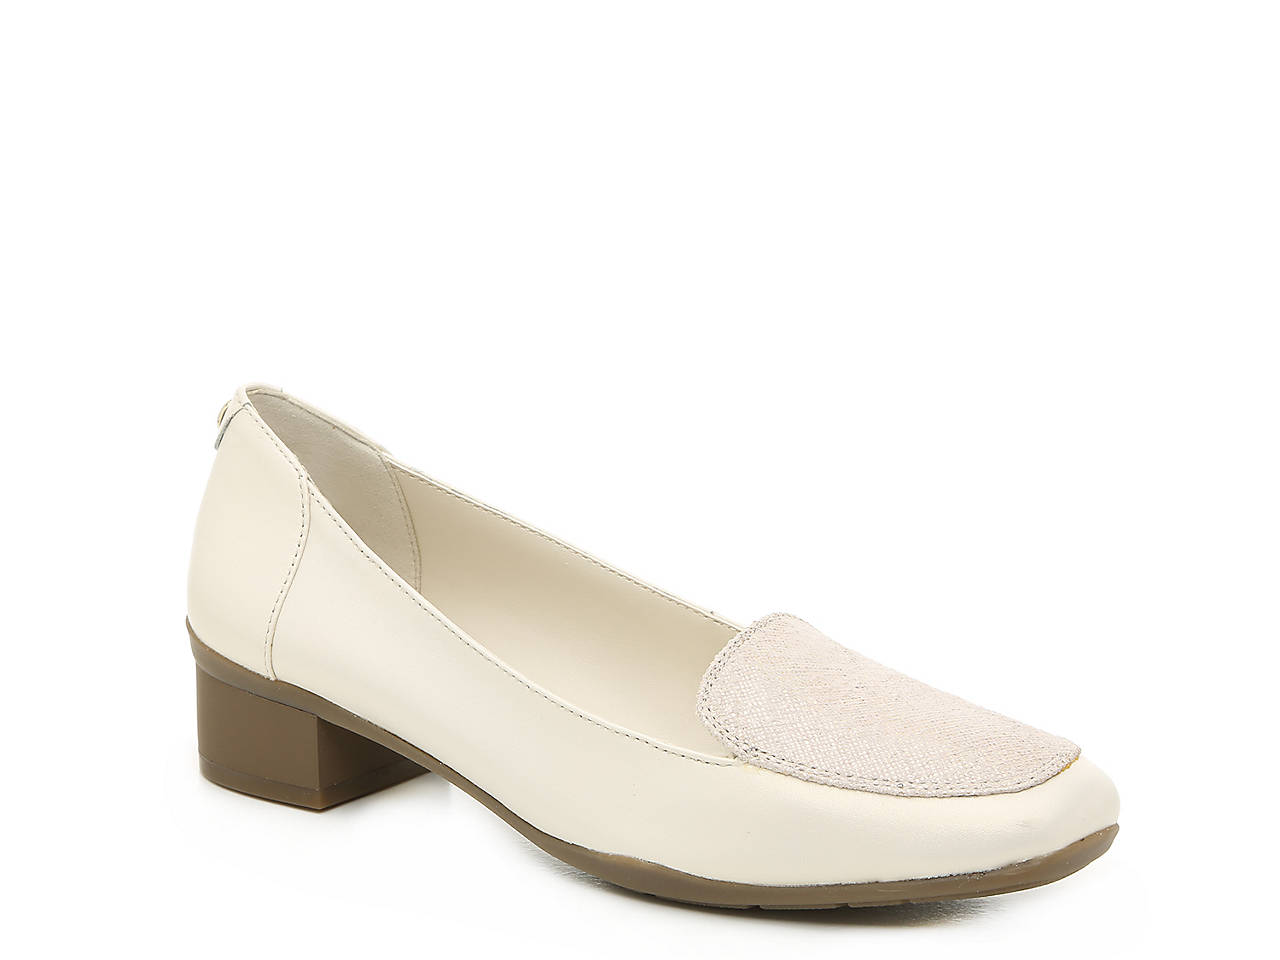 bb13ab8cc26 Anne Klein Daneen Loafer Women s Shoes